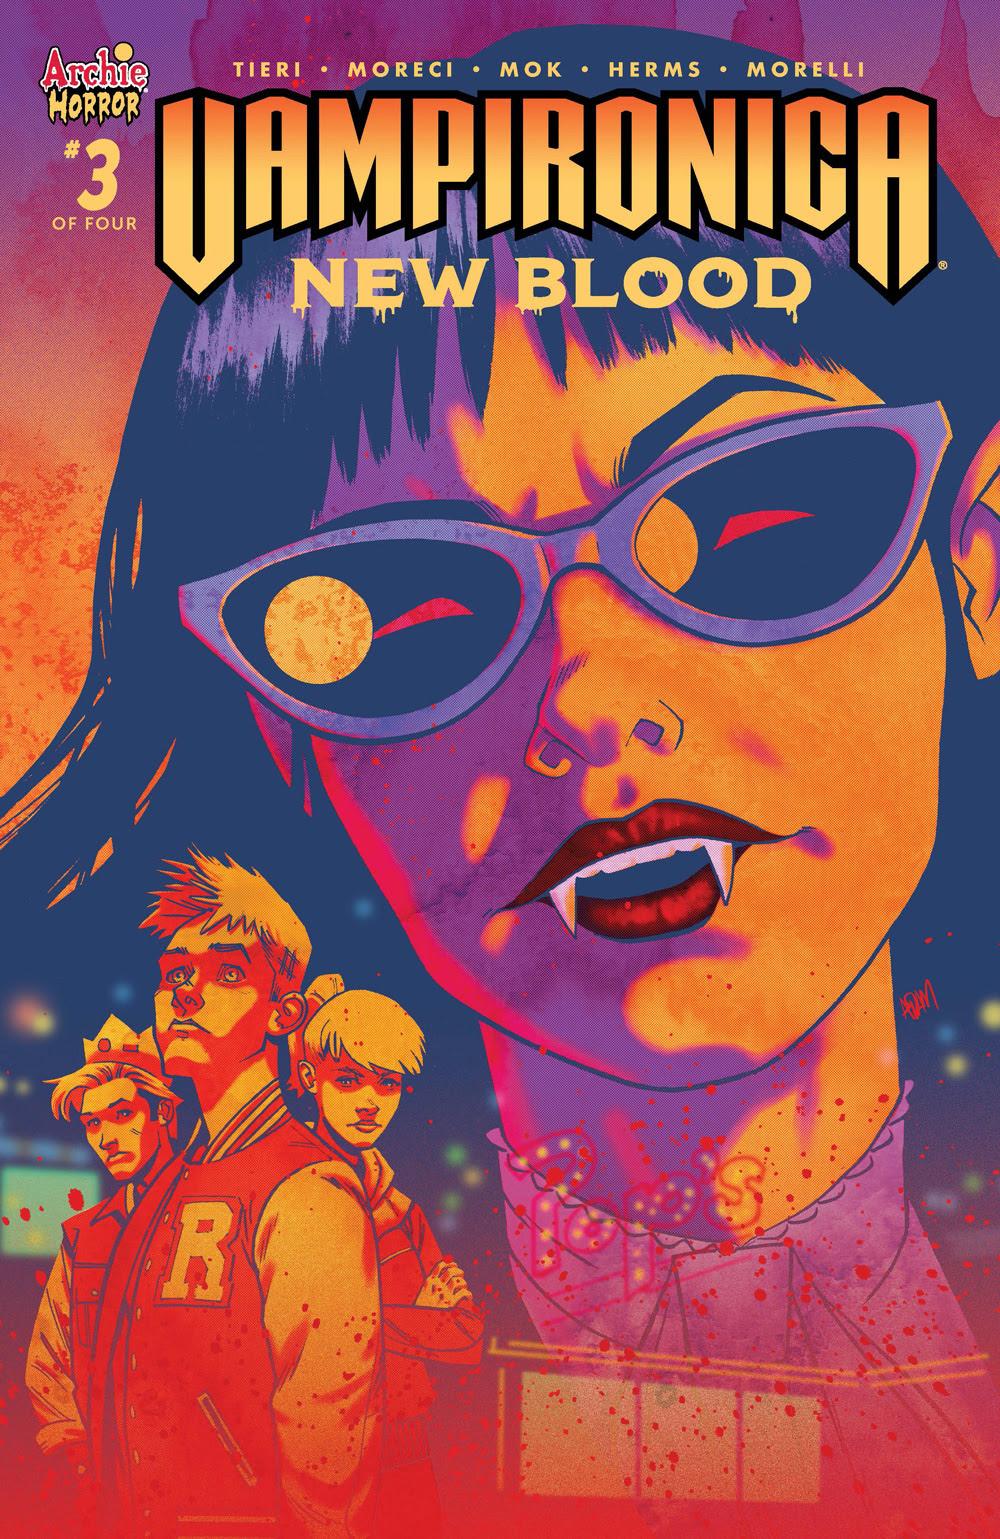 VAMPIRONICA: NEW BLOOD #3: CVR B Gorham